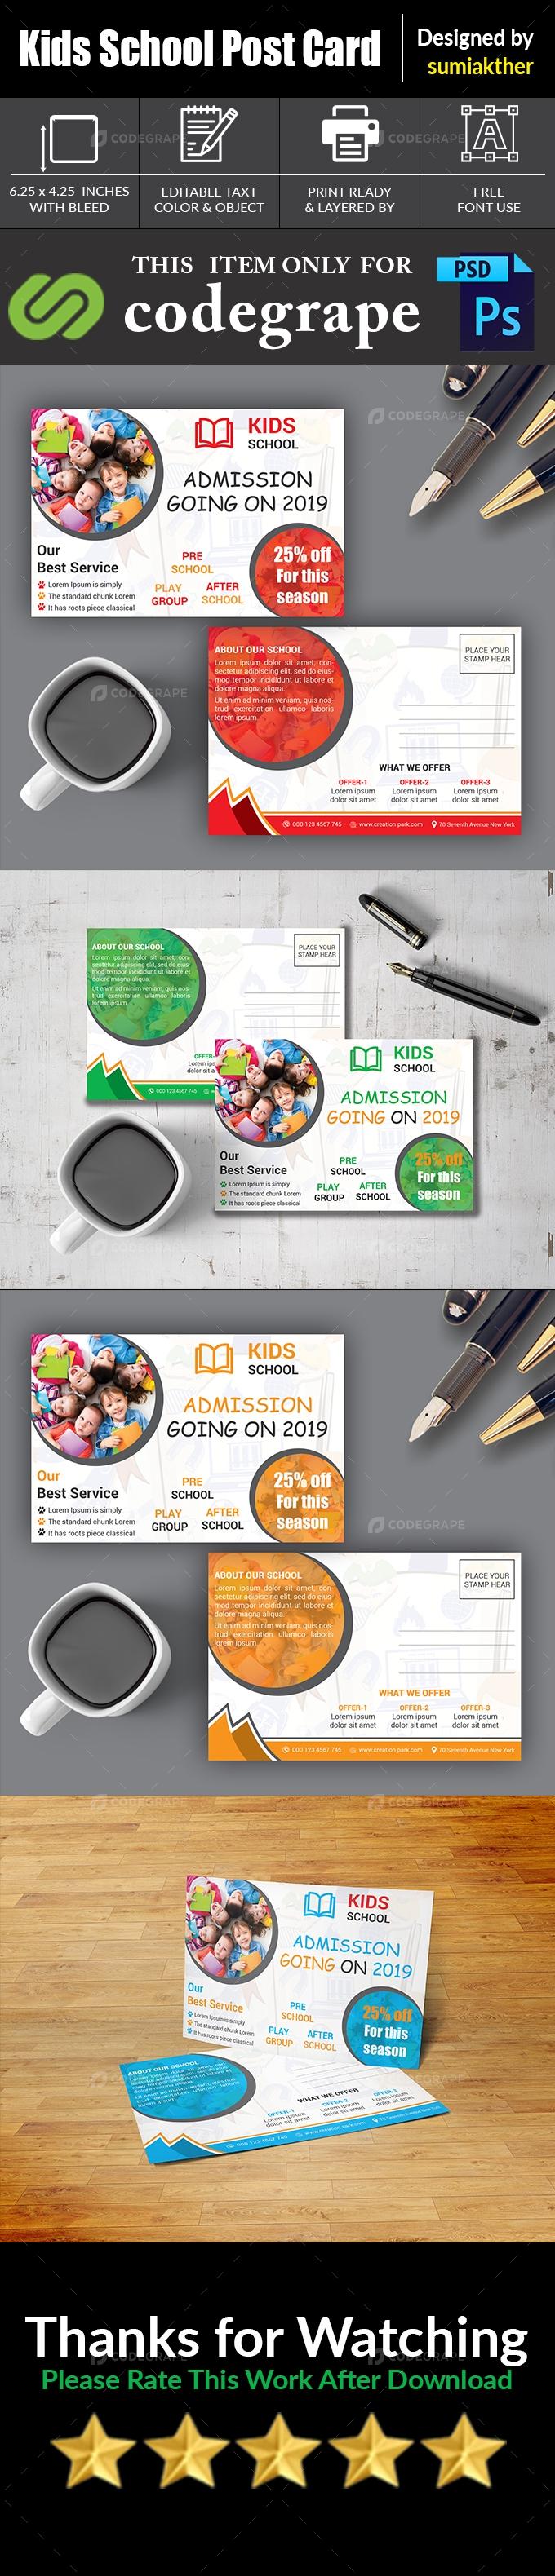 Kids School Post Card